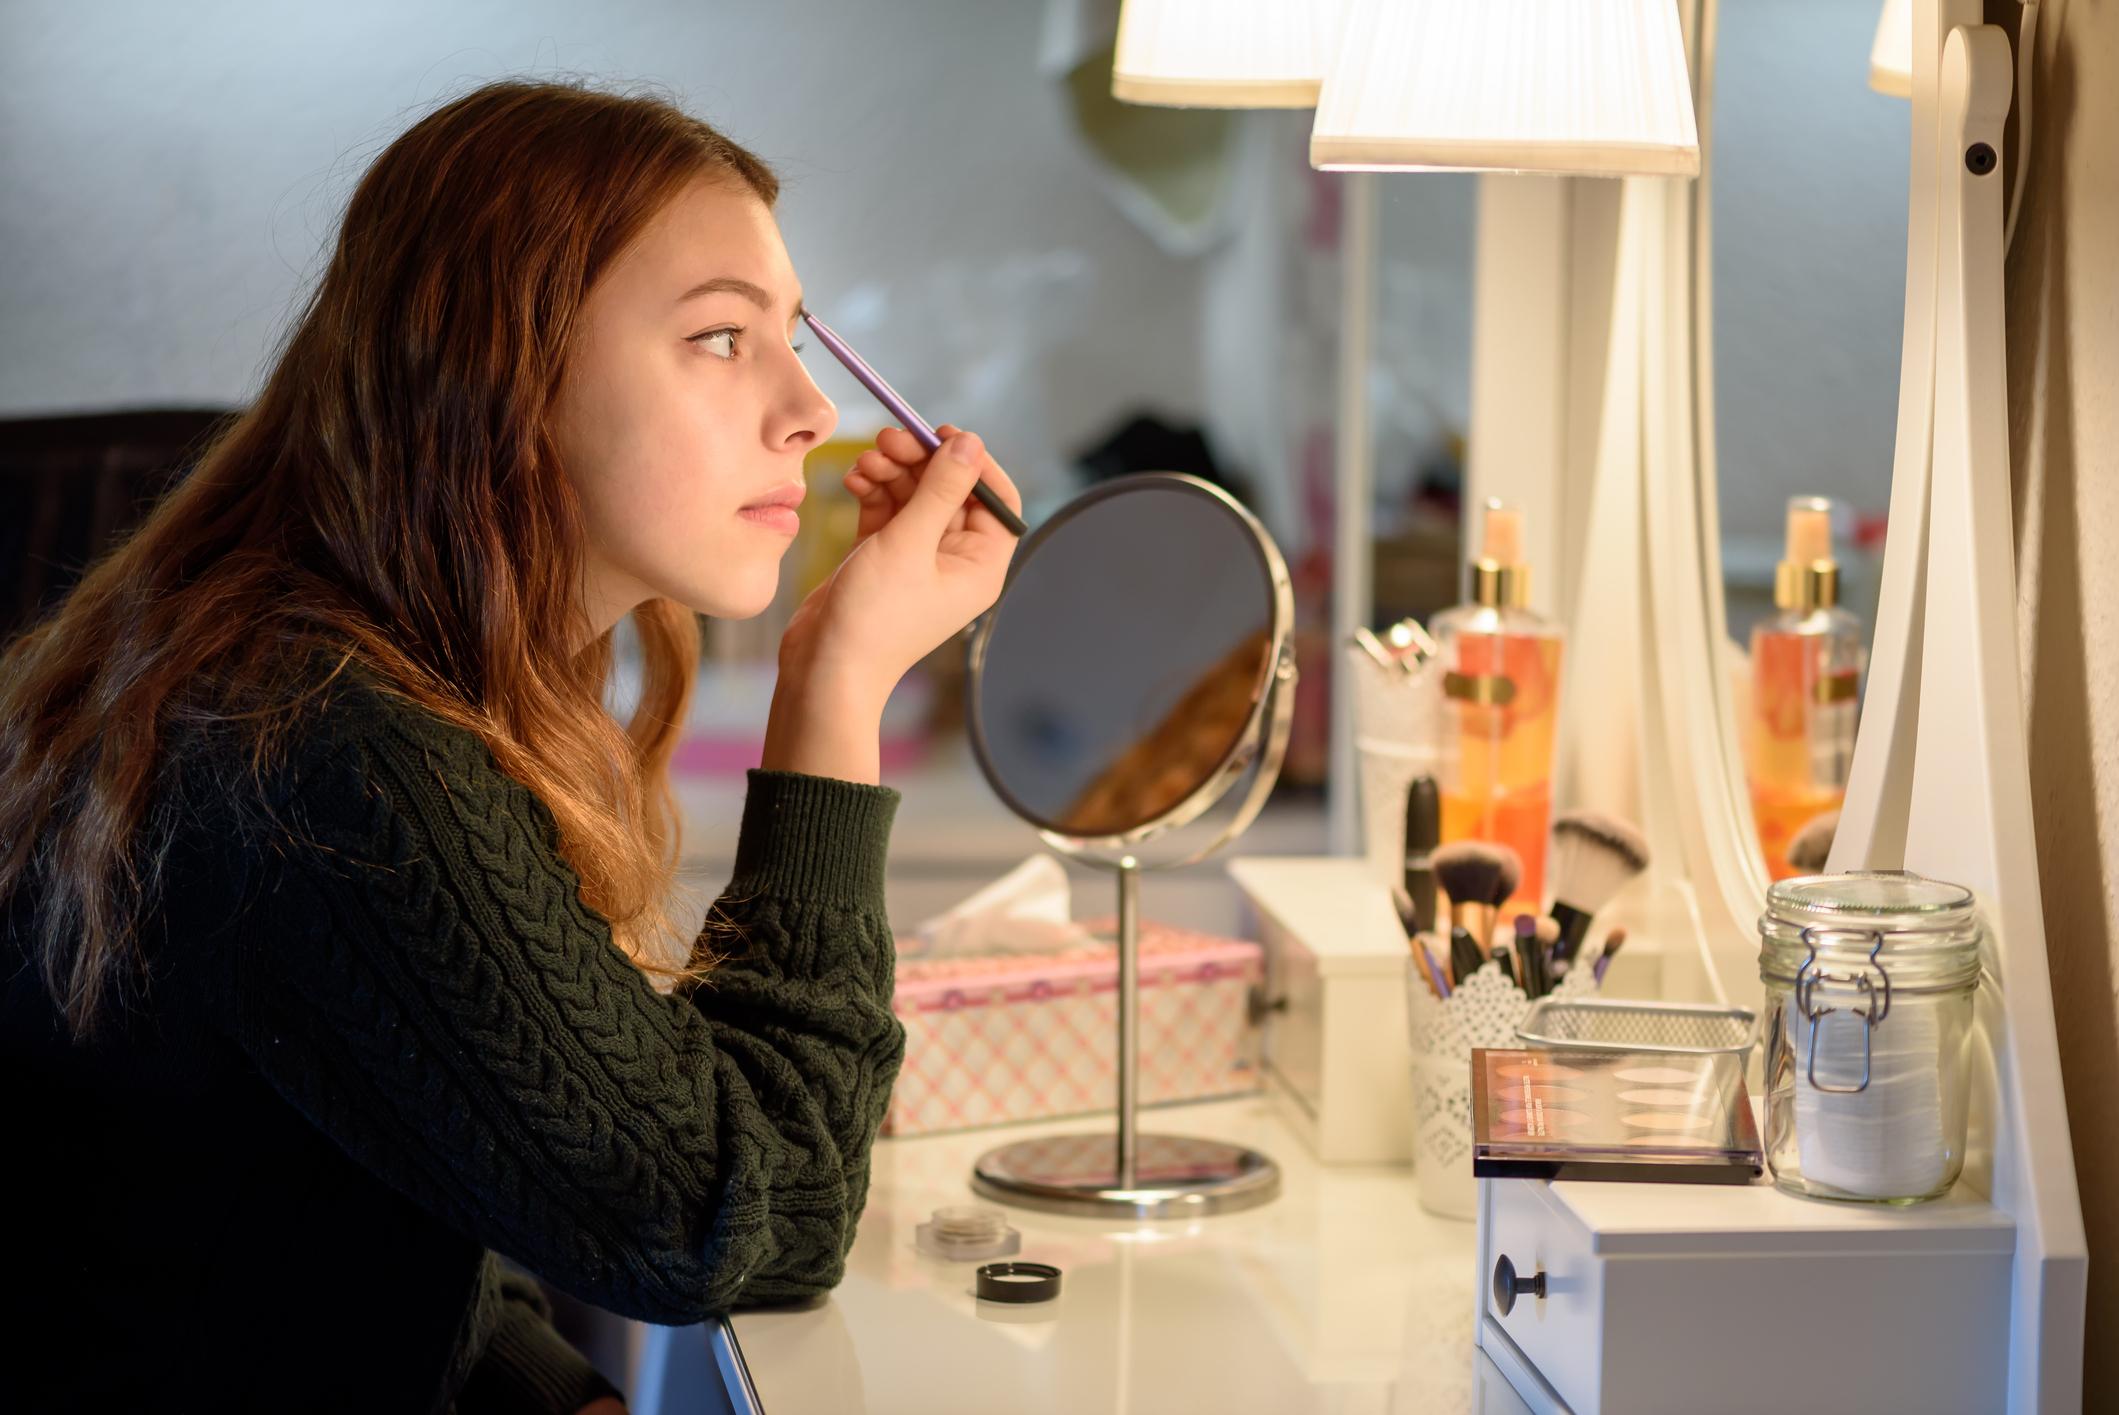 A woman putting on makeup.